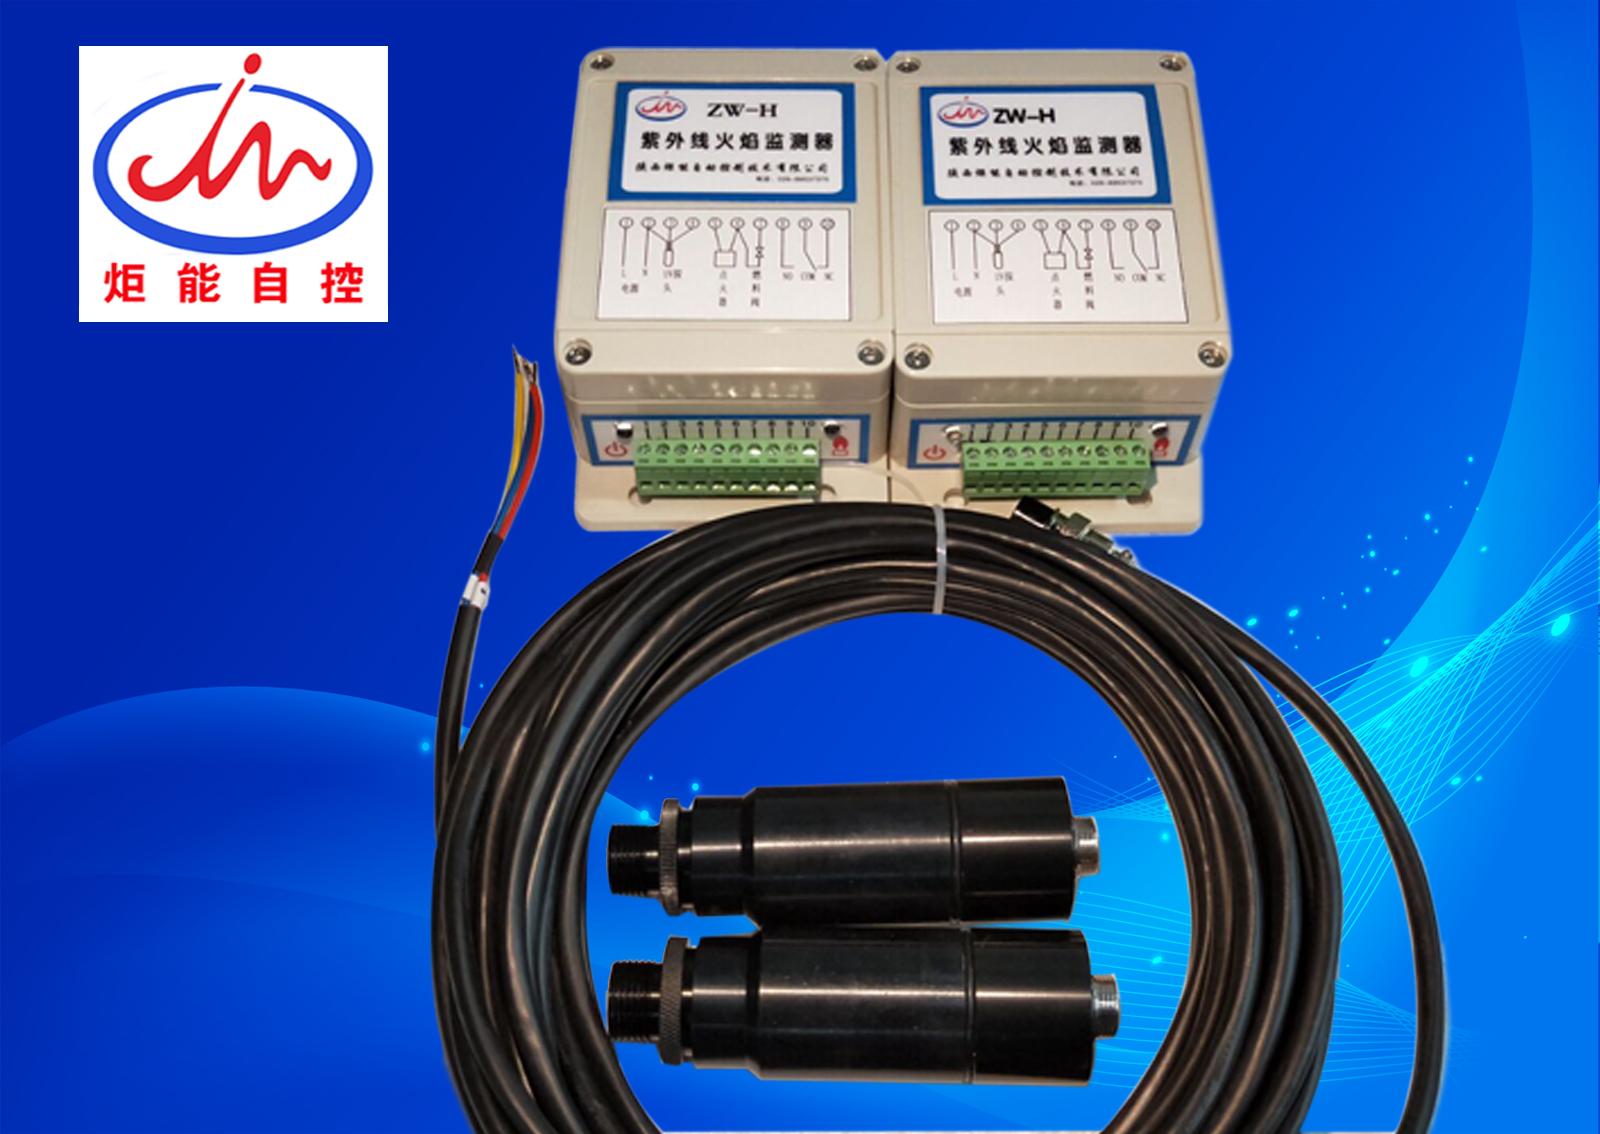 ZW-H紫外线火焰监测器